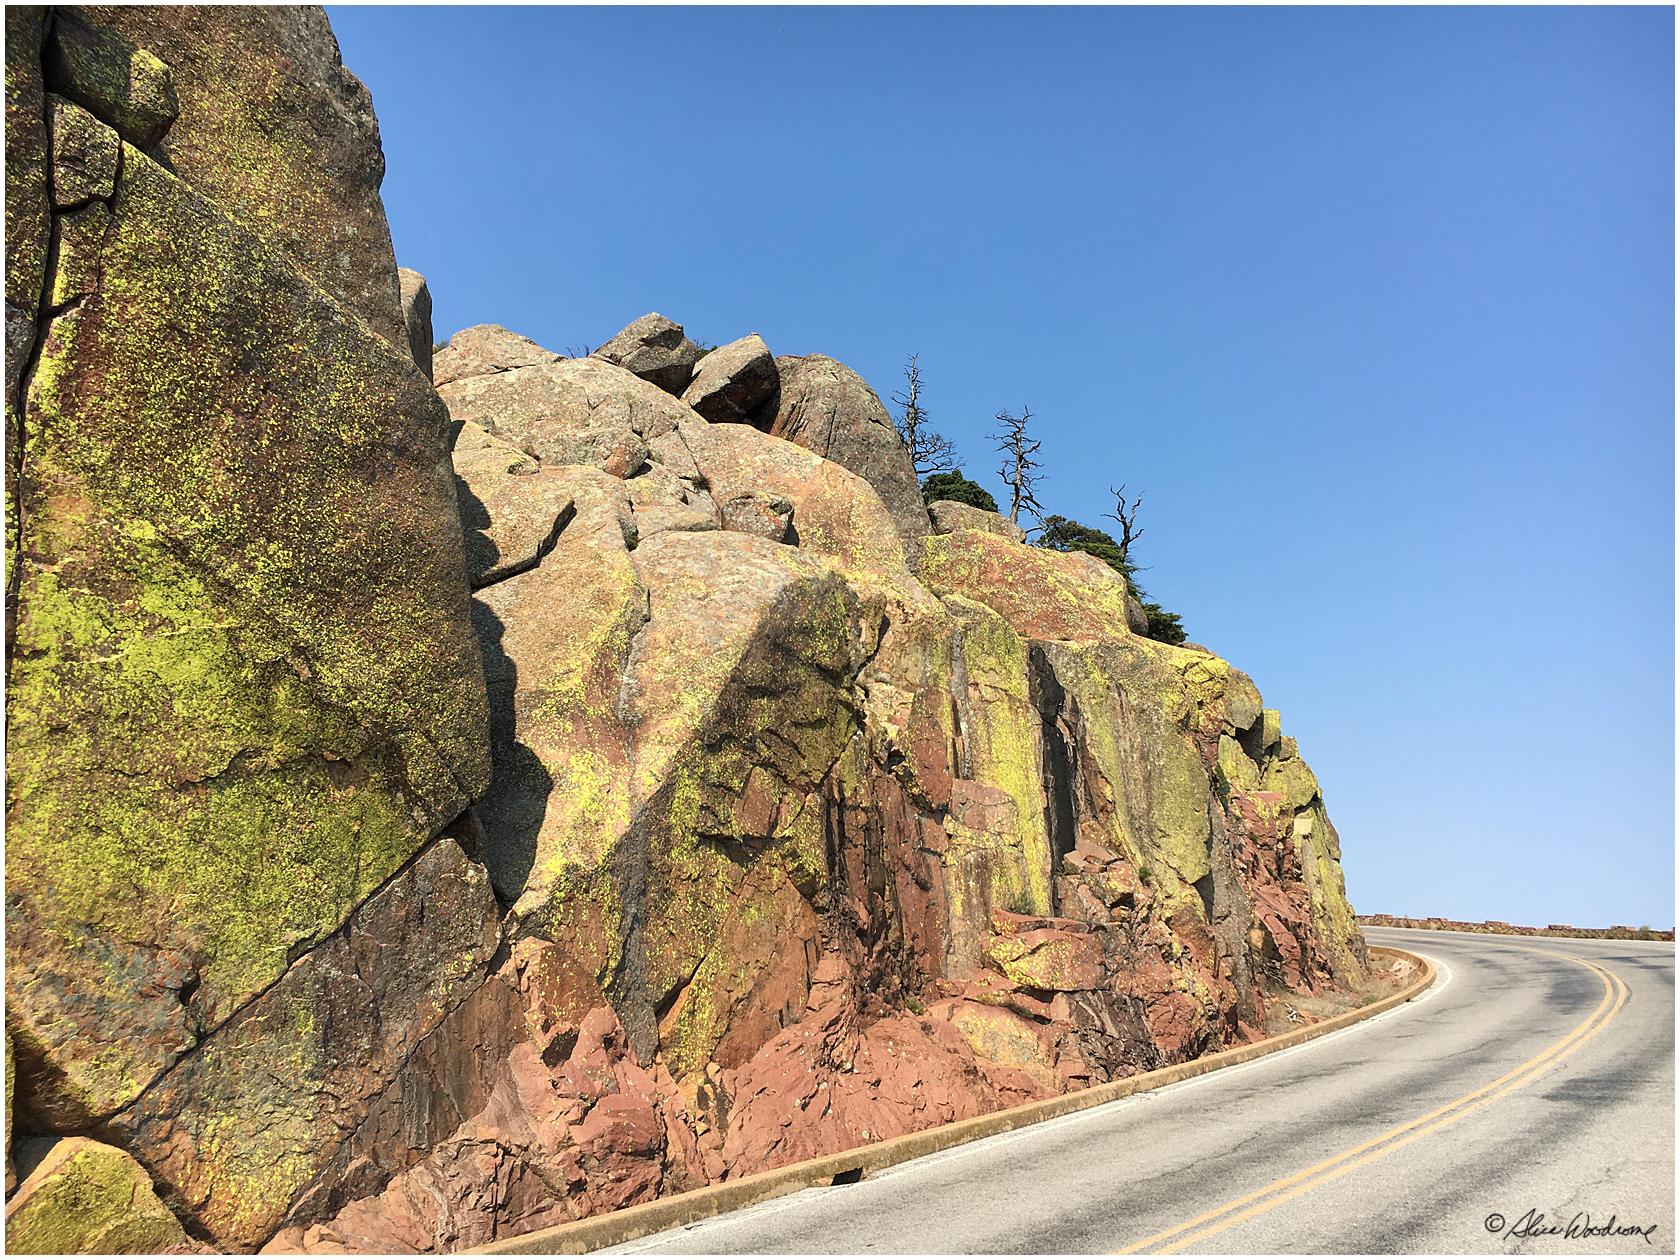 On the road on Mount Scott